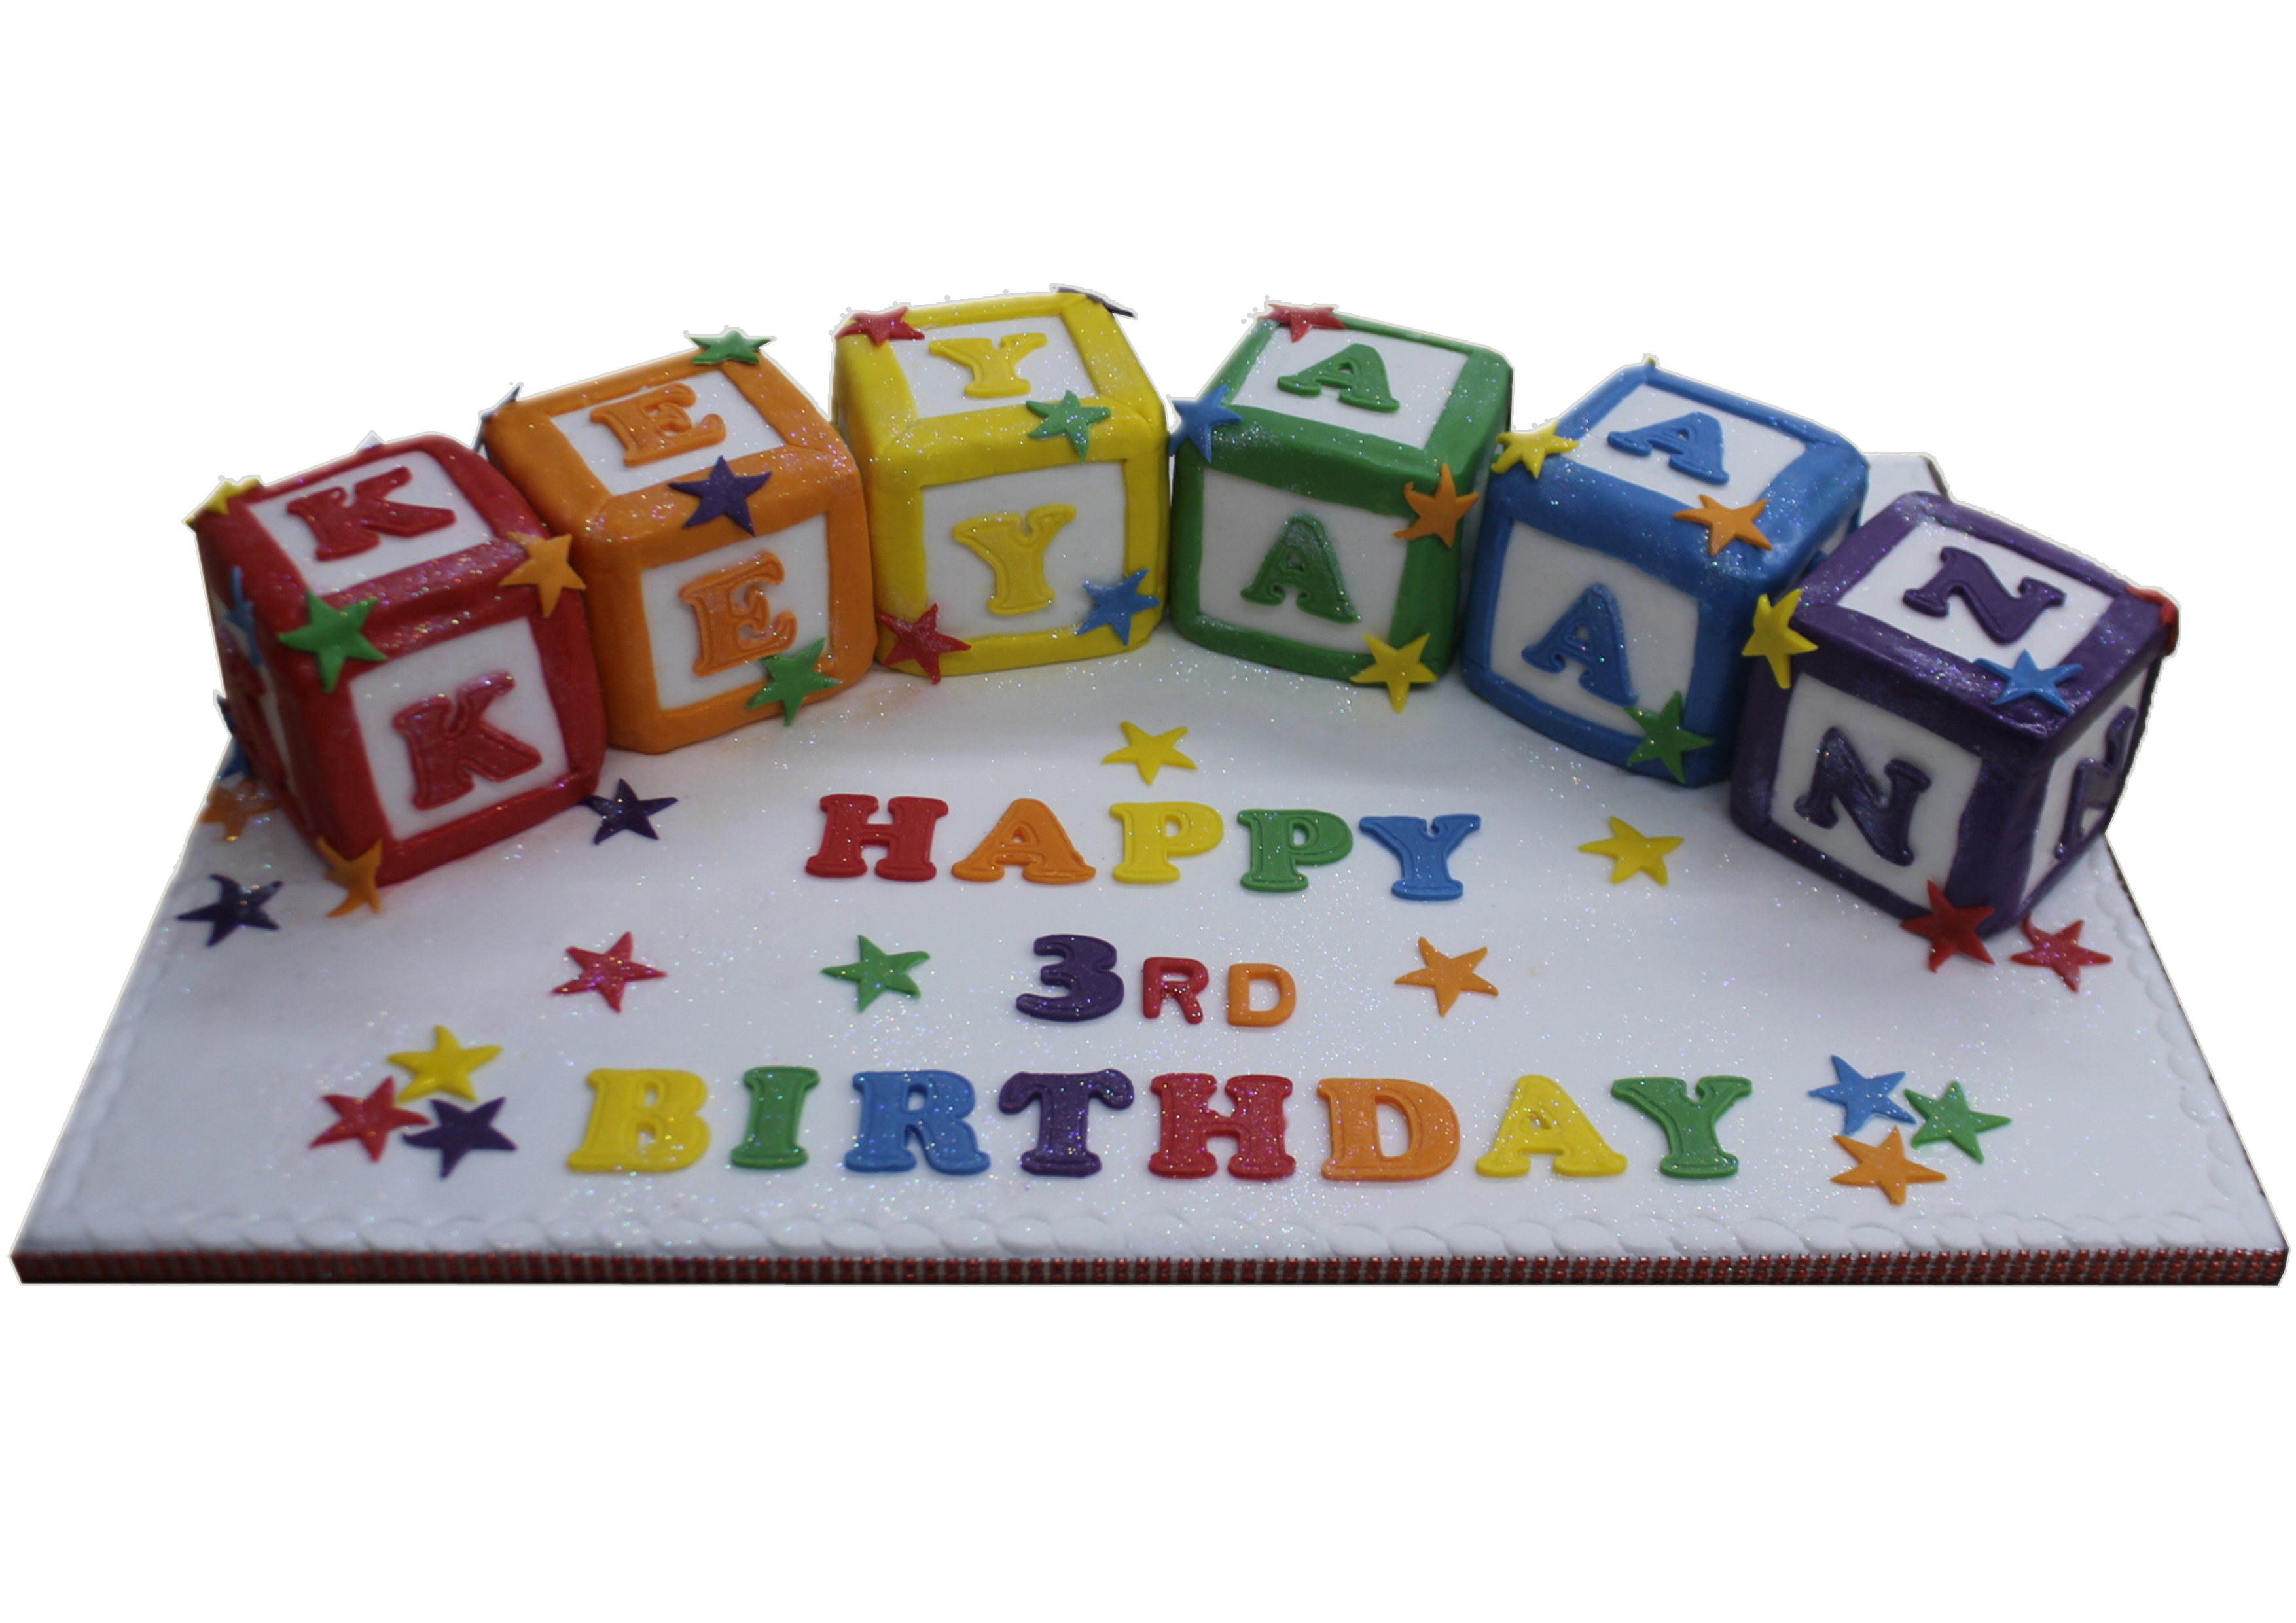 Groovy Blocks Name Cake B171 6 Letters Only Bismillah Bakery Birthday Cards Printable Riciscafe Filternl